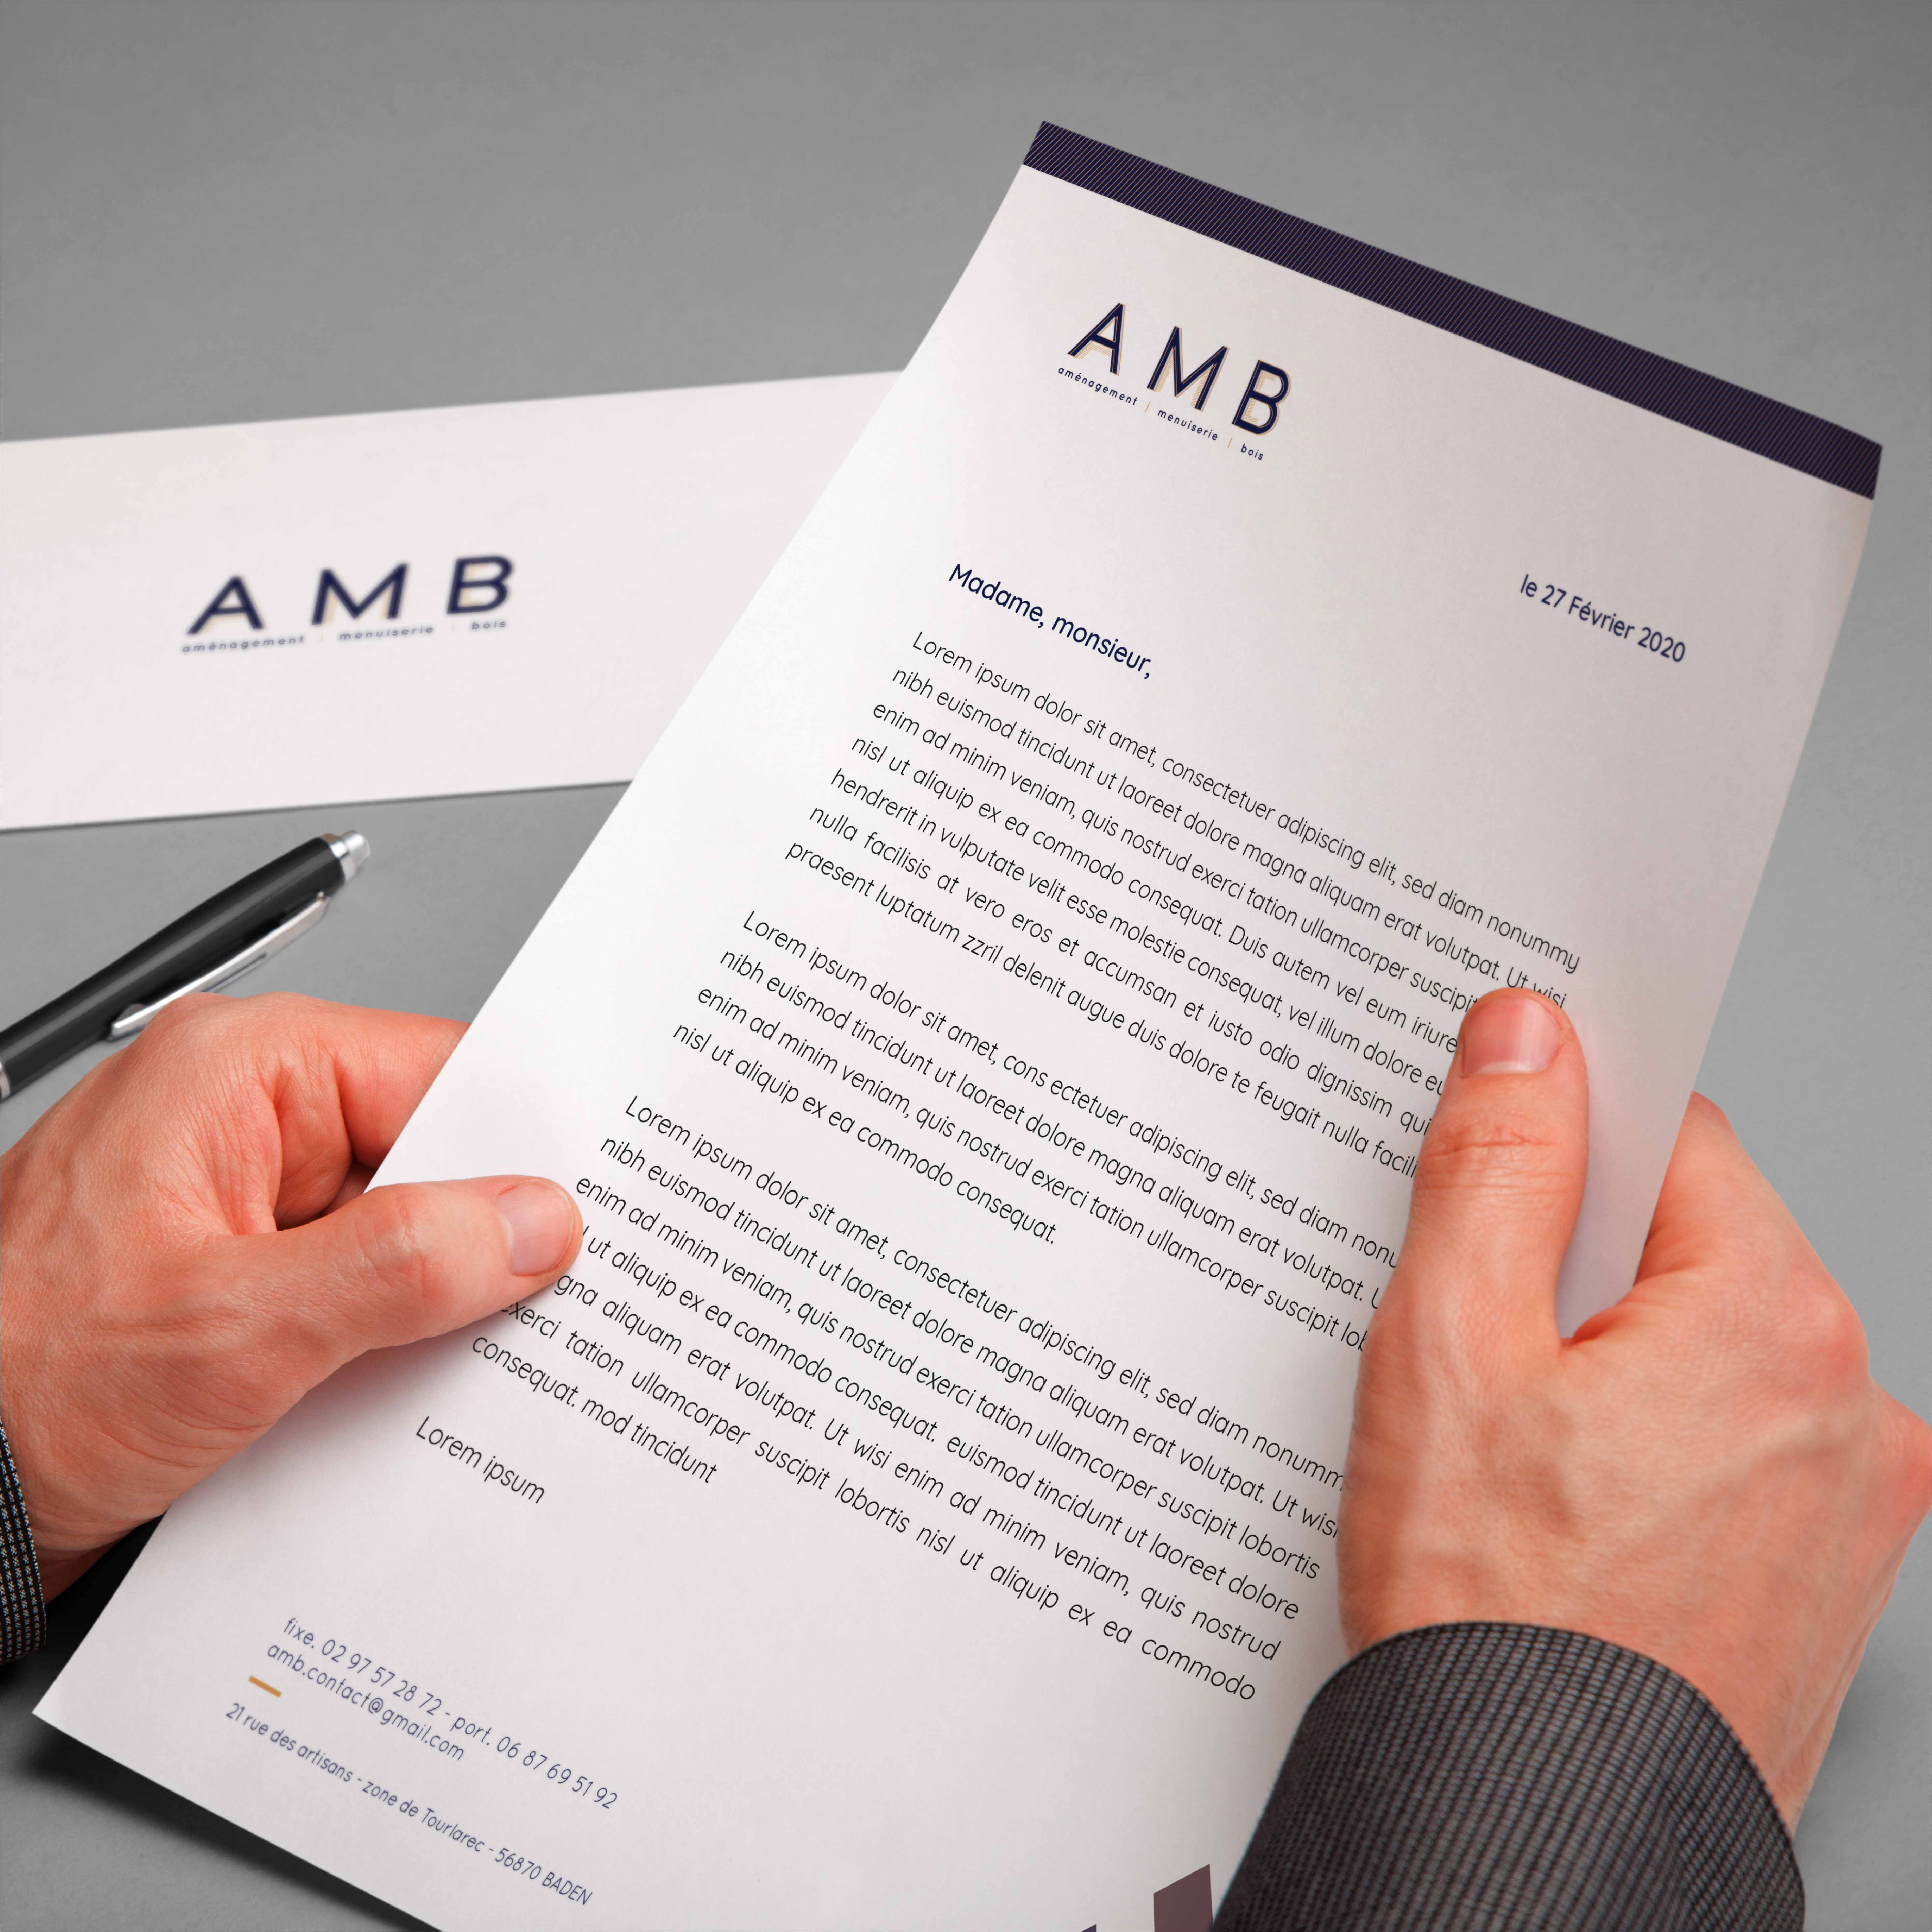 AMB - office